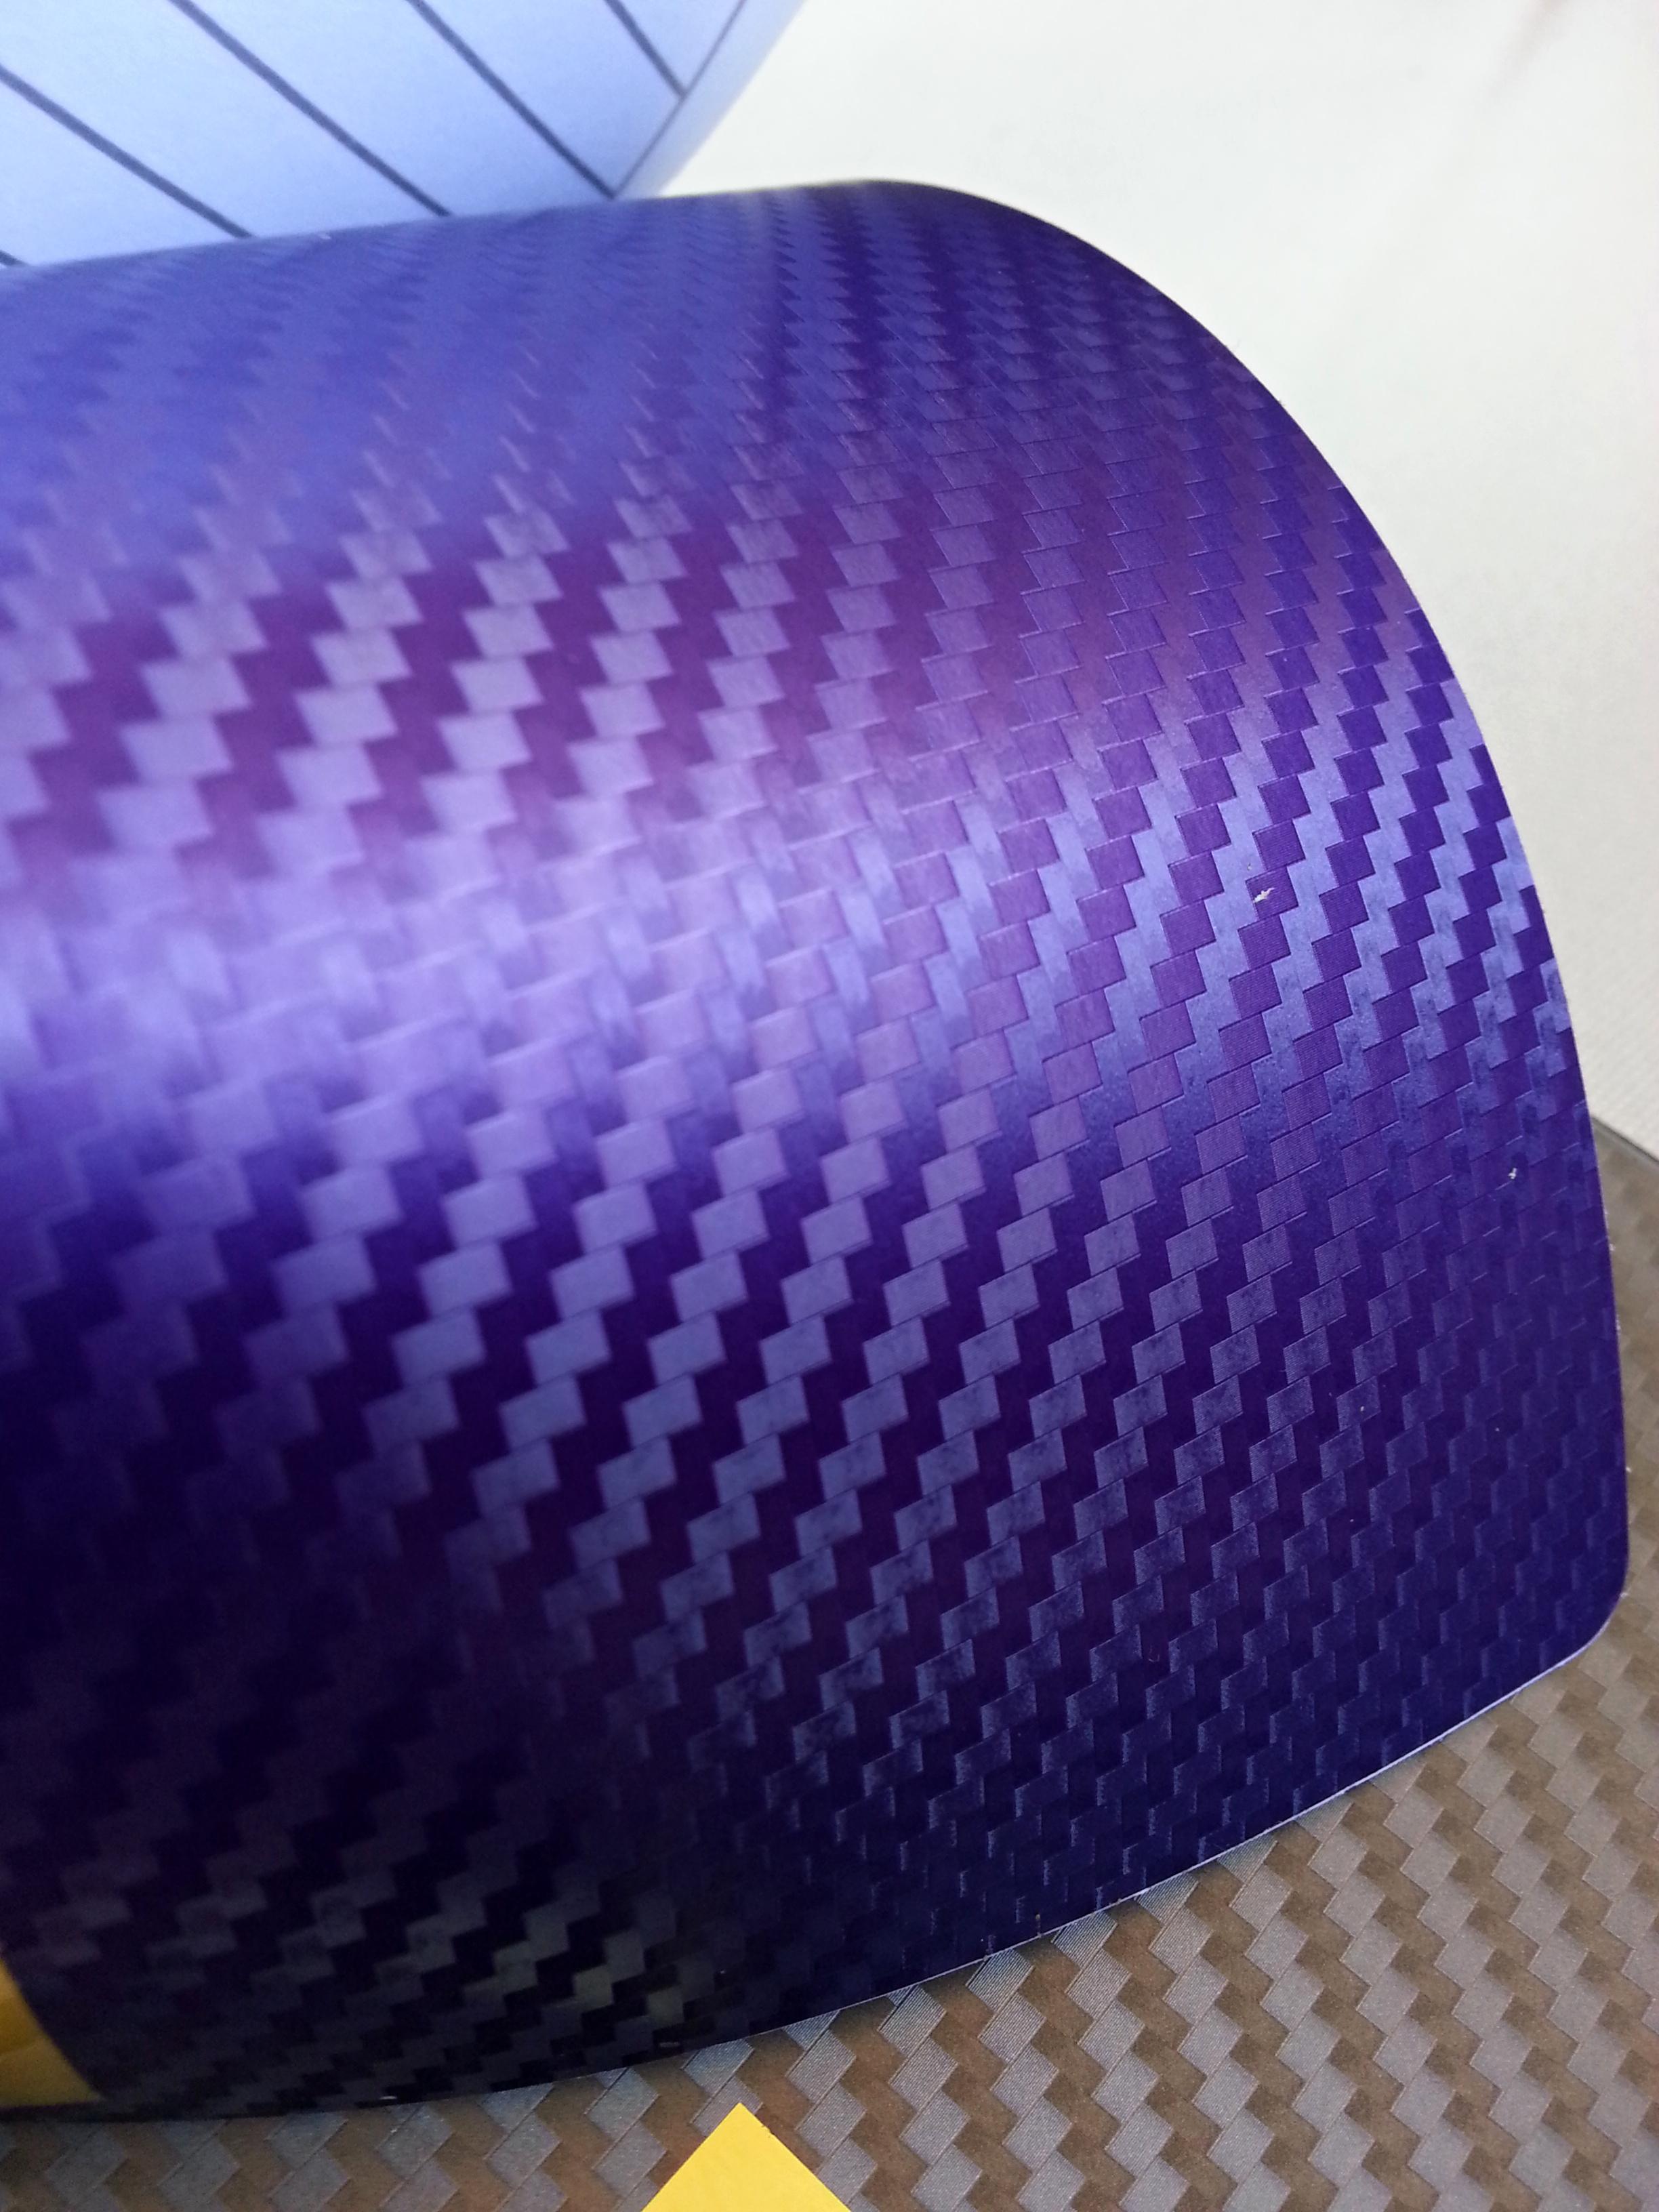 152cm x 15m CARBON KARBON FOLIE 3D - Purpurová se vzduchovými kanálky